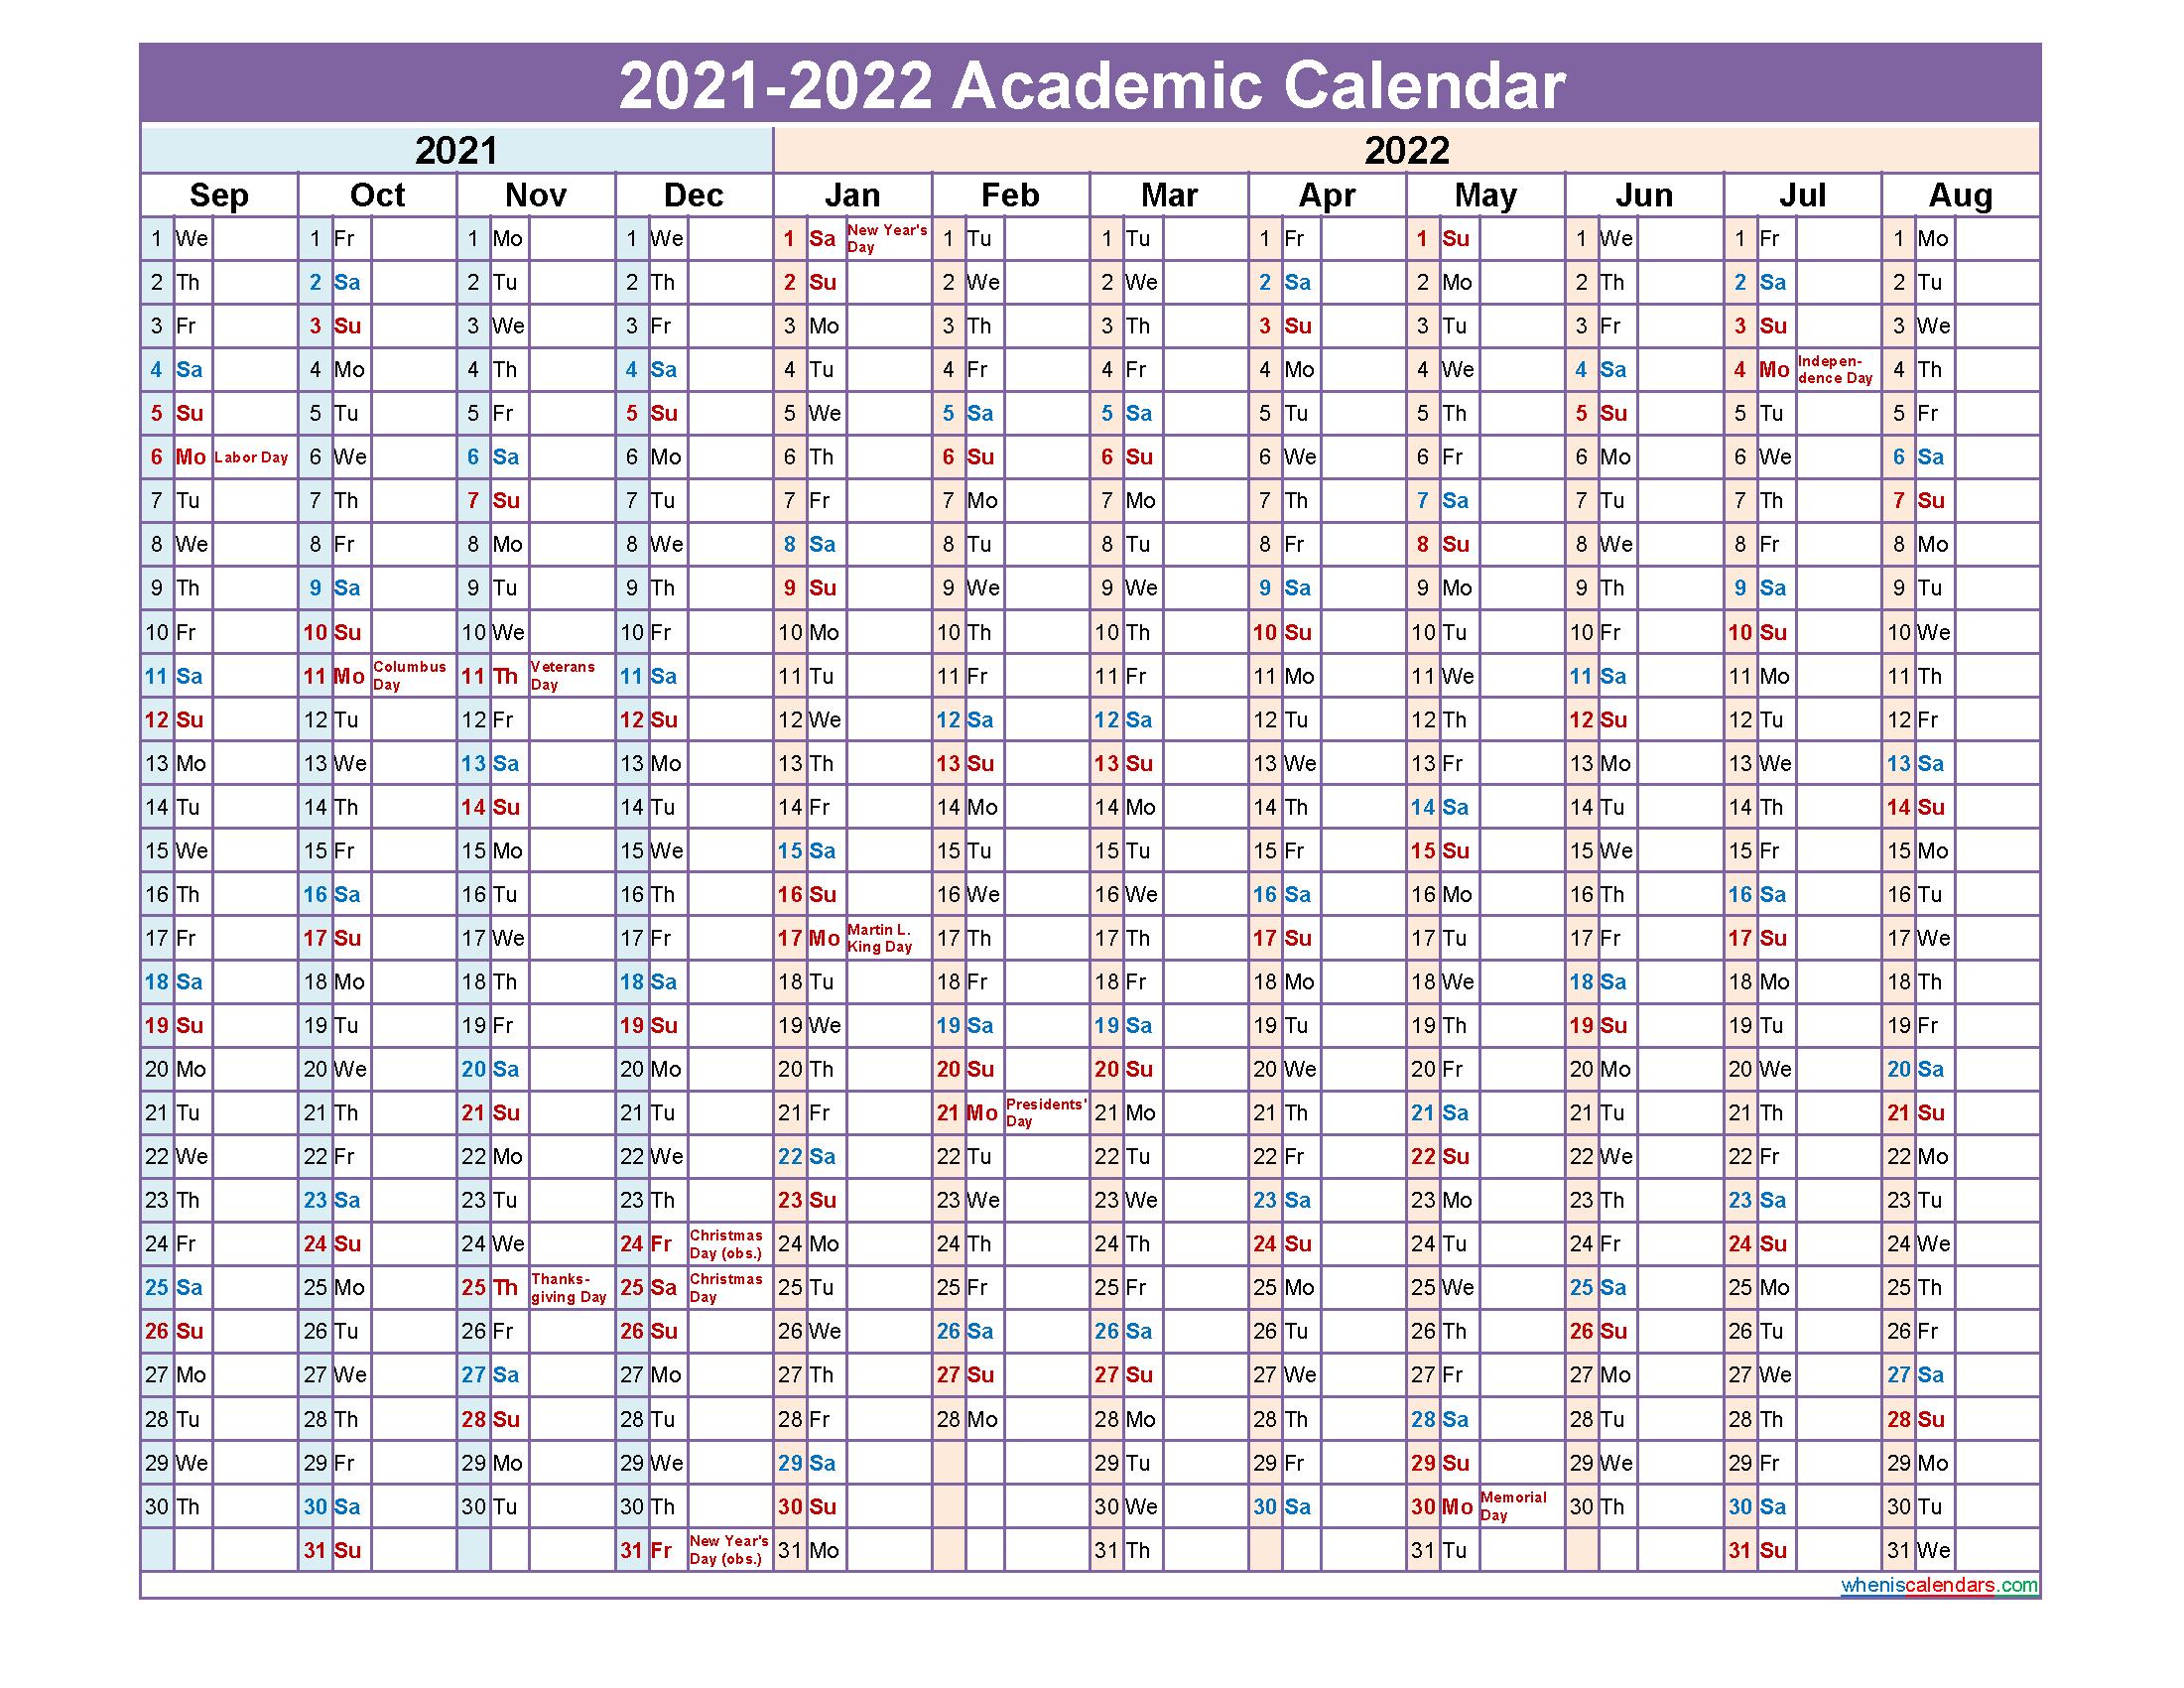 University Of Arkansas Academic Calendar 2021 2022 | Lunar ...